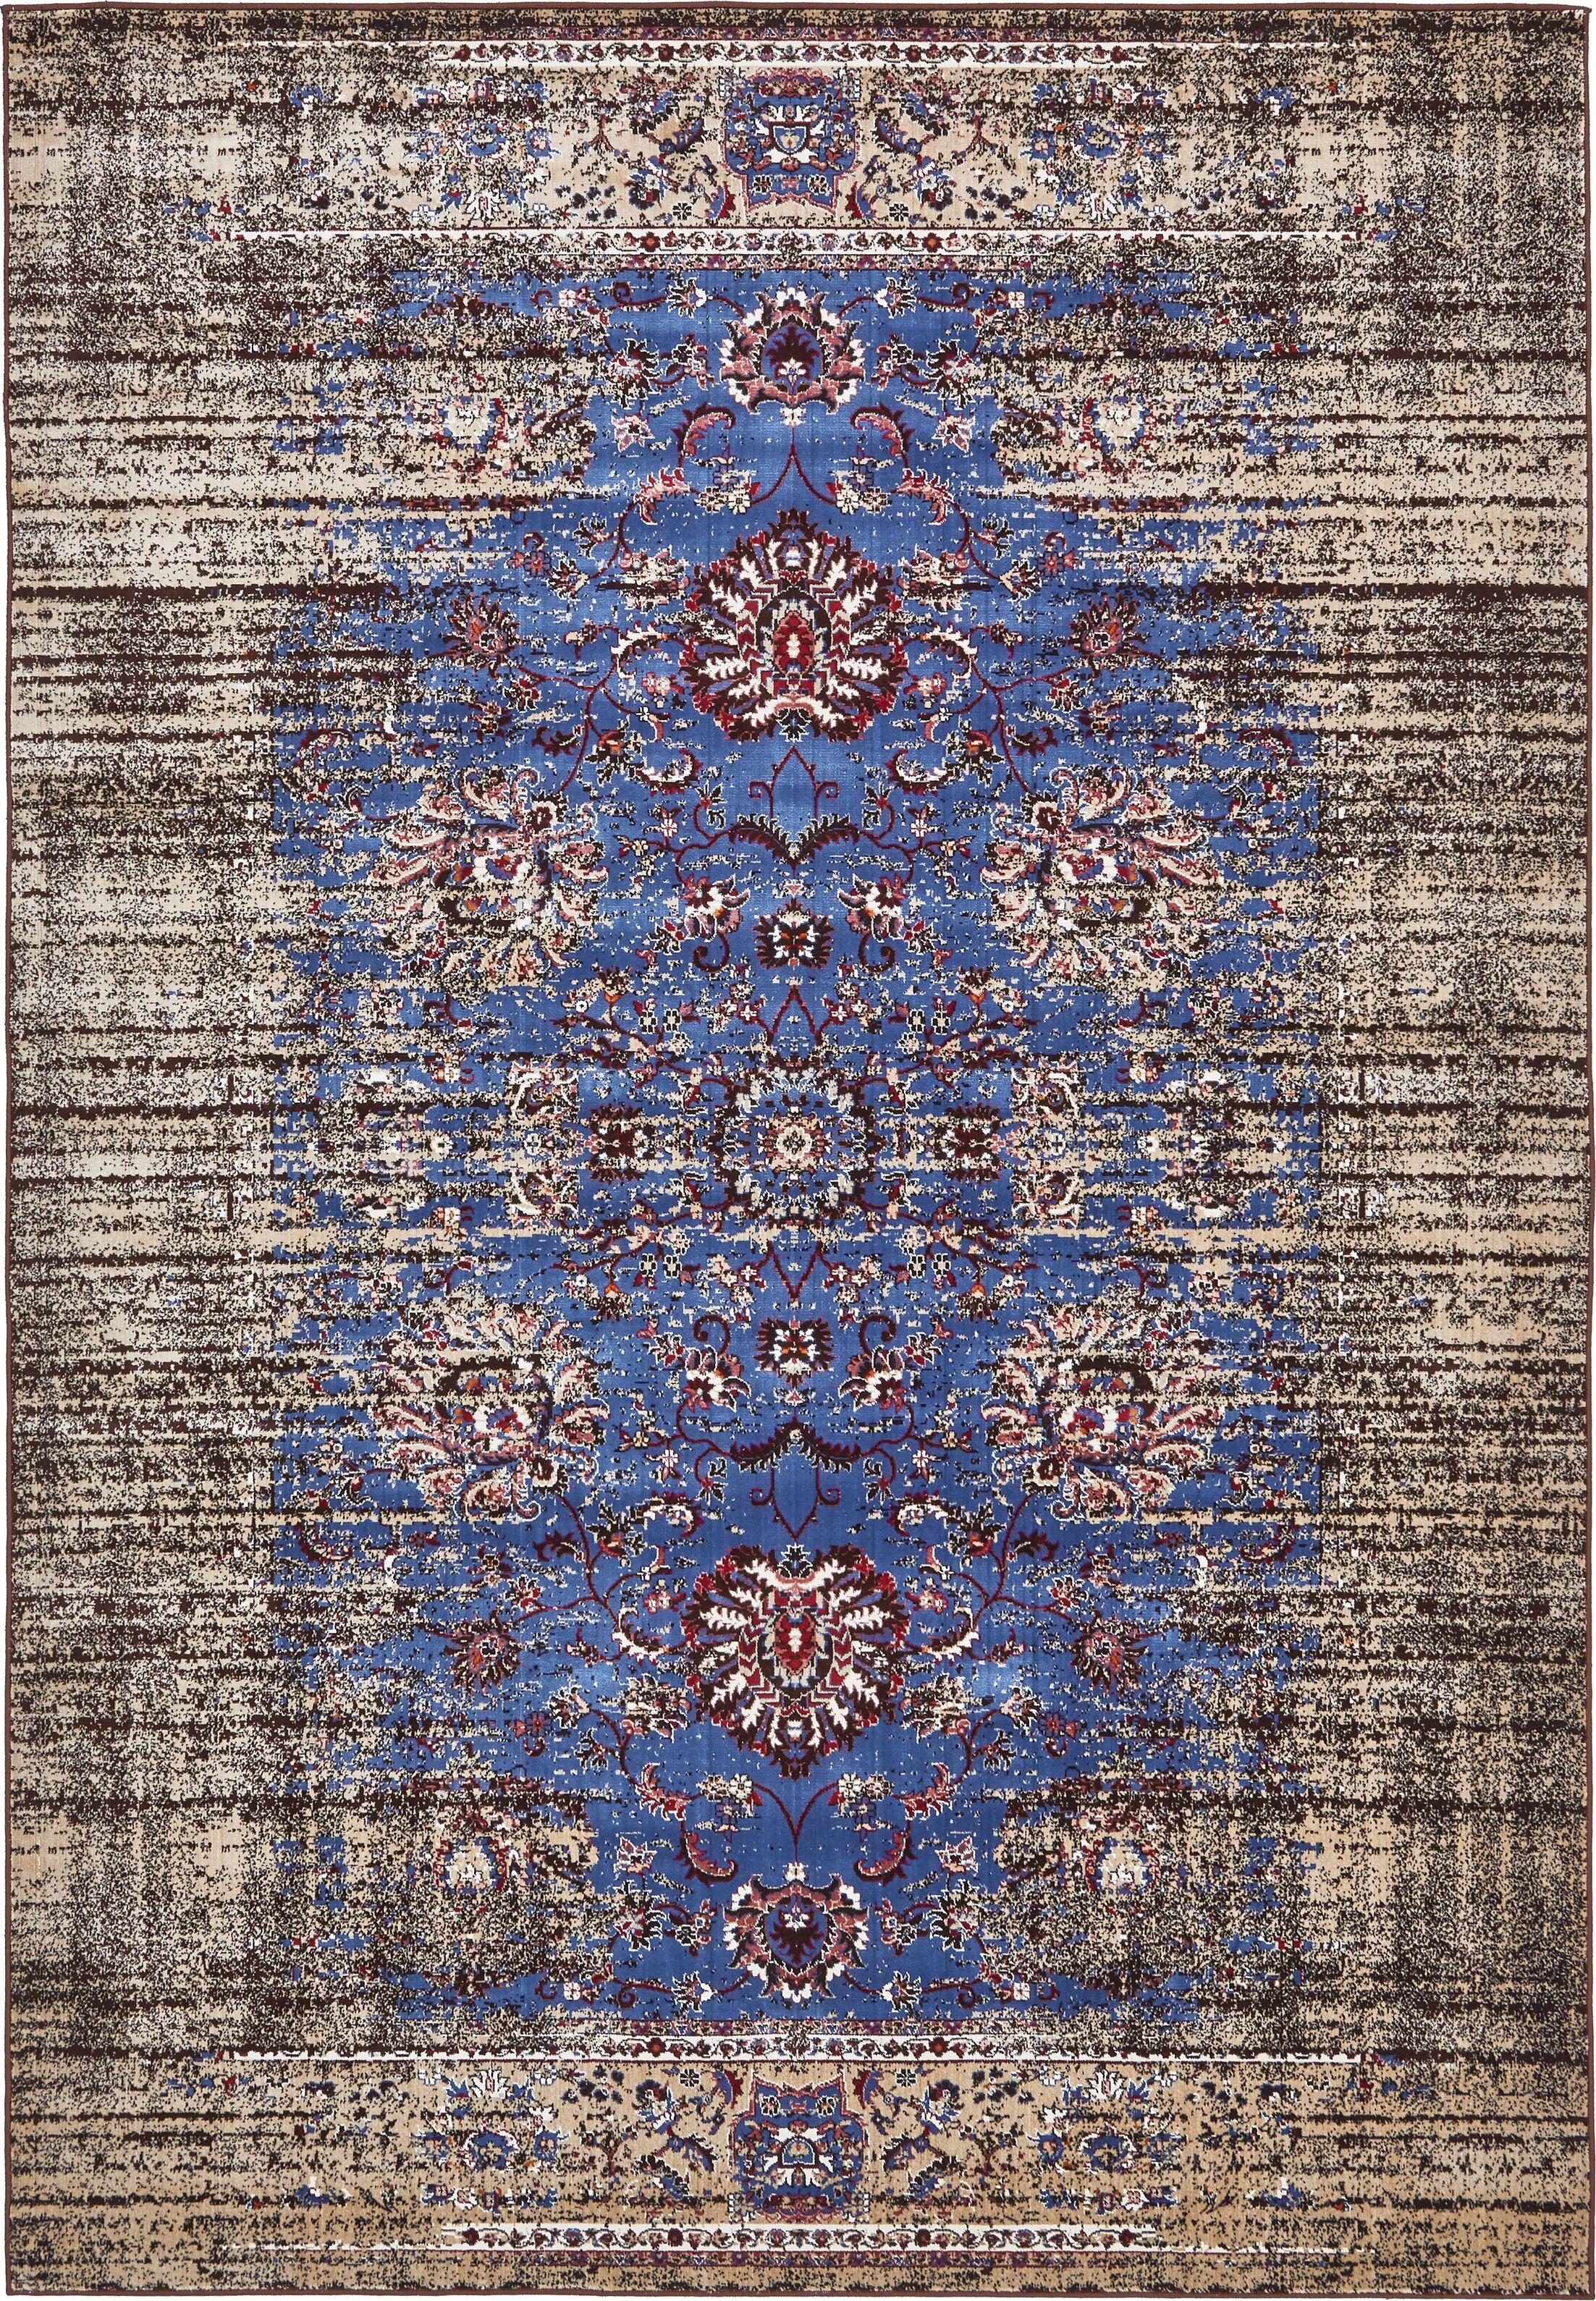 Florence Blue/Ivory Area Rug Rug Size: Rectangle 7' x 10'